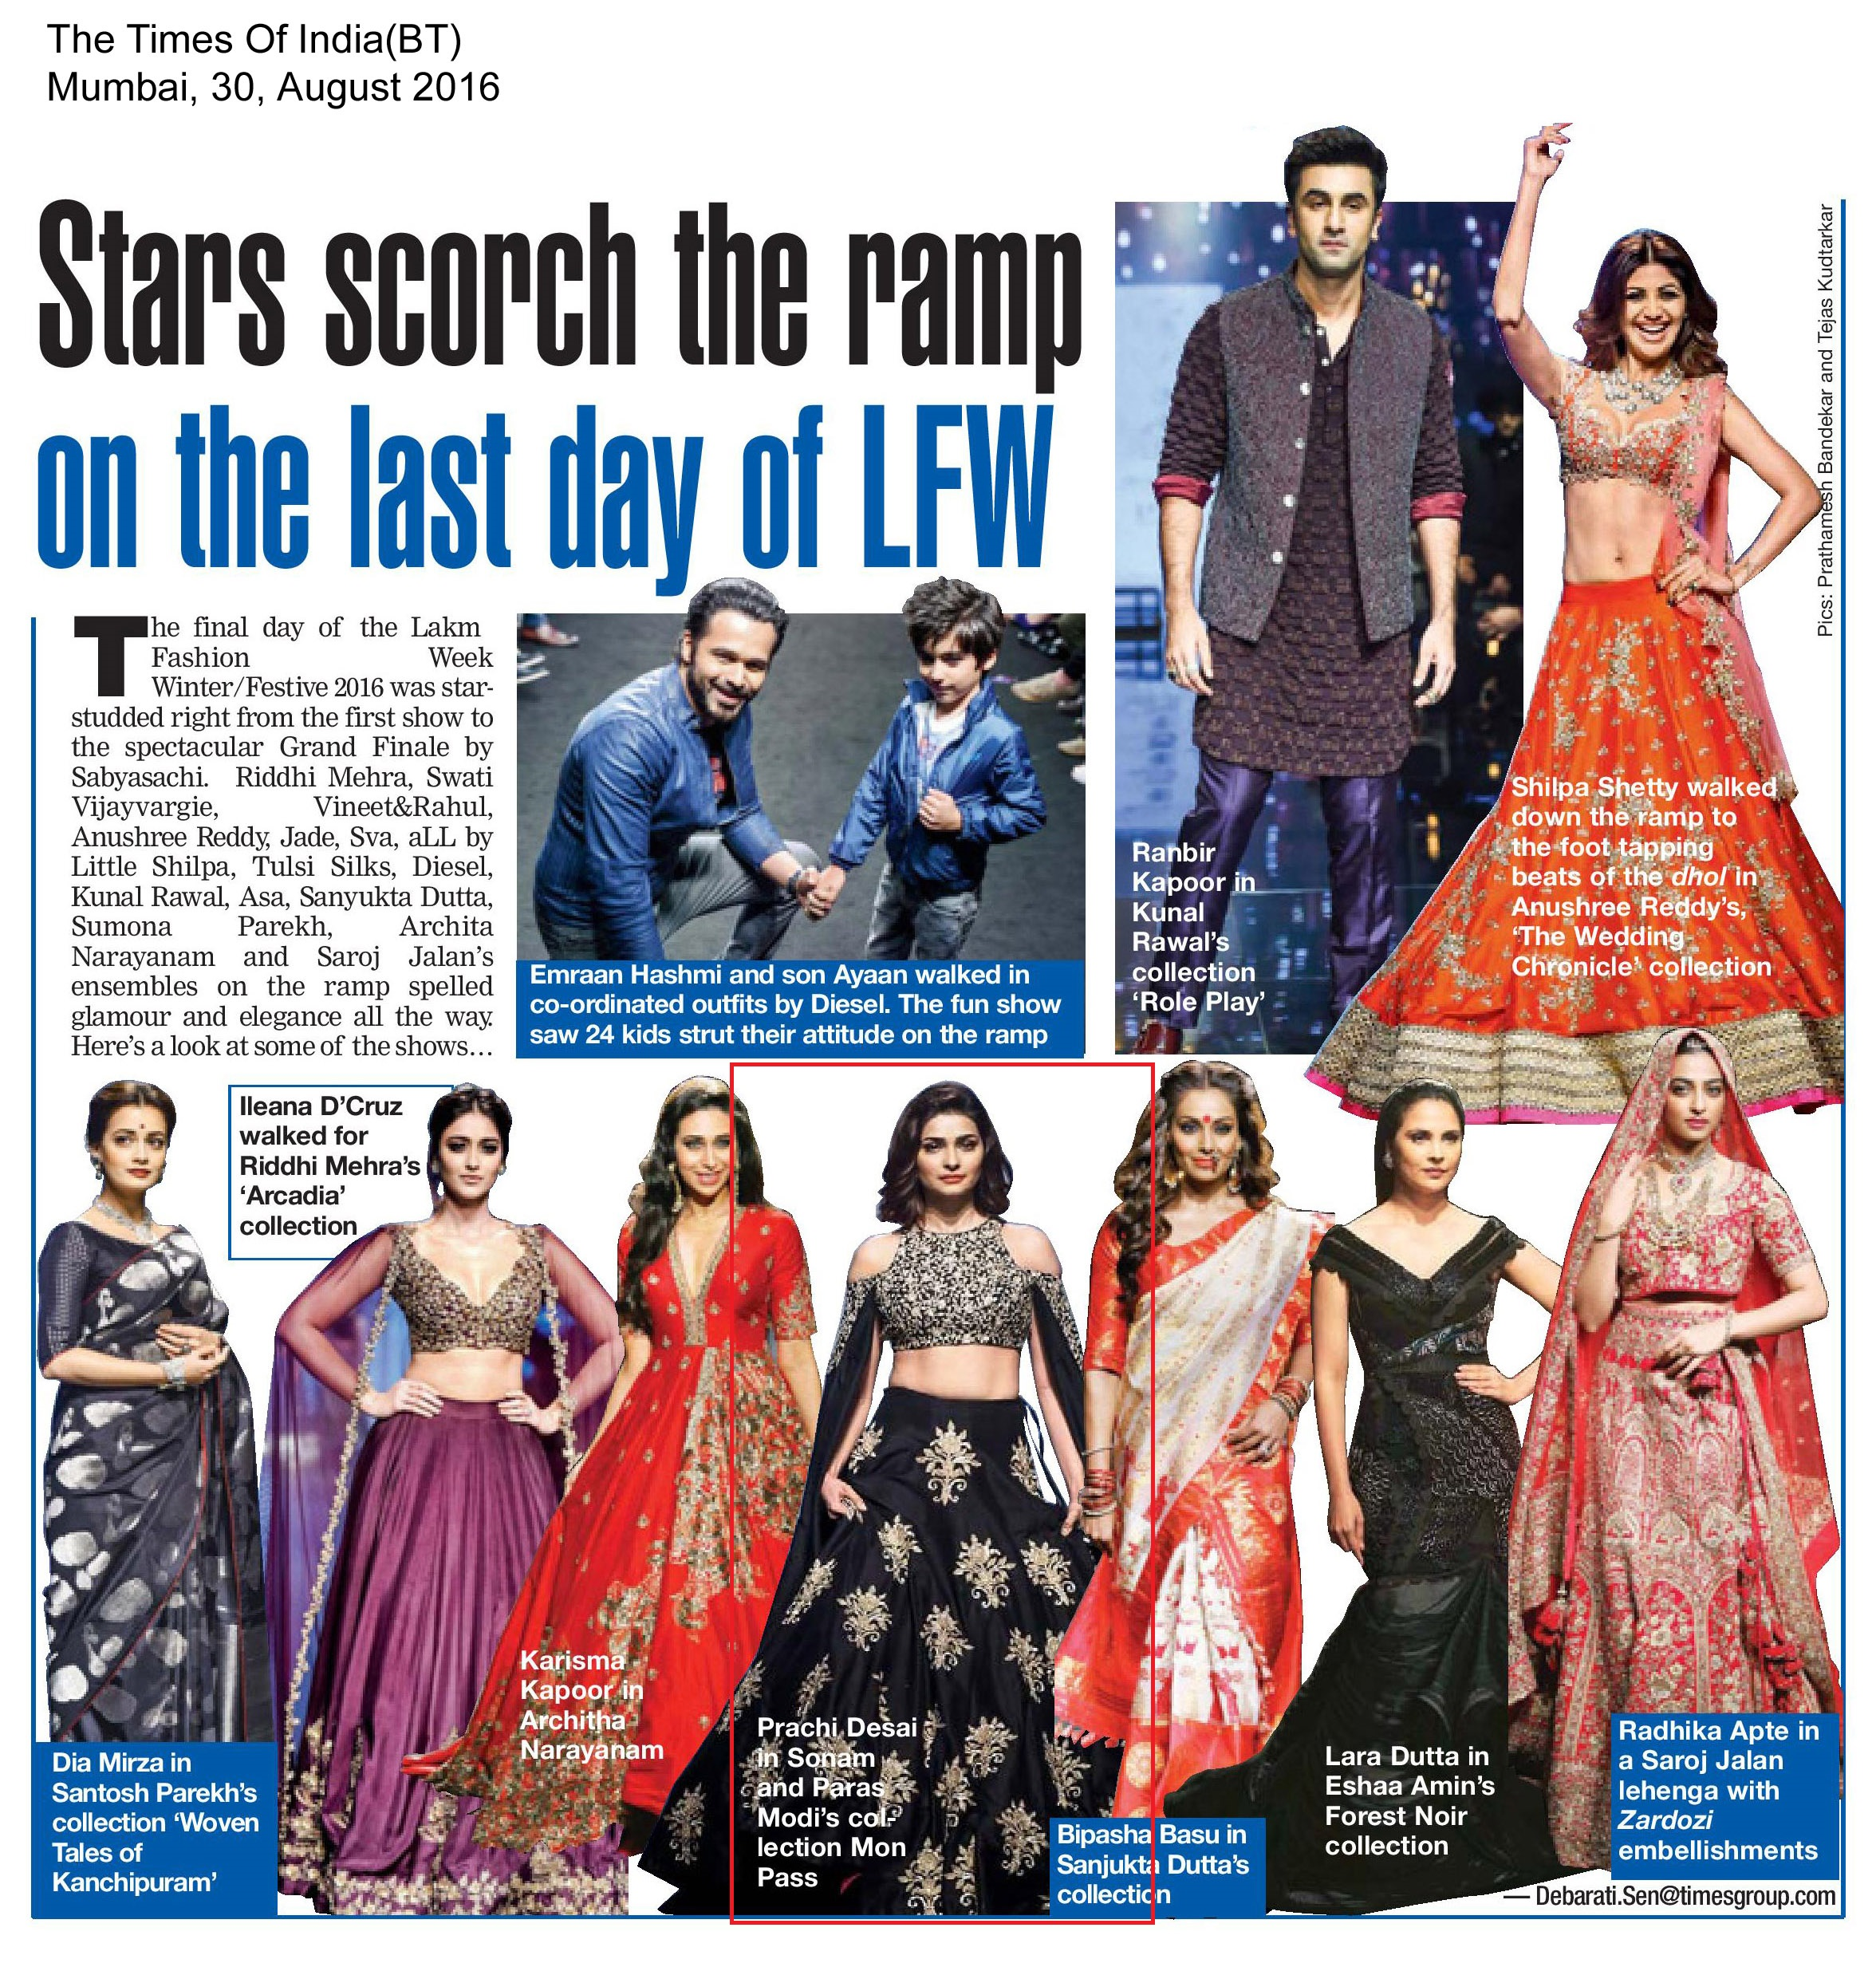 The Times Of India(BT)_Mumbai copy.jpg